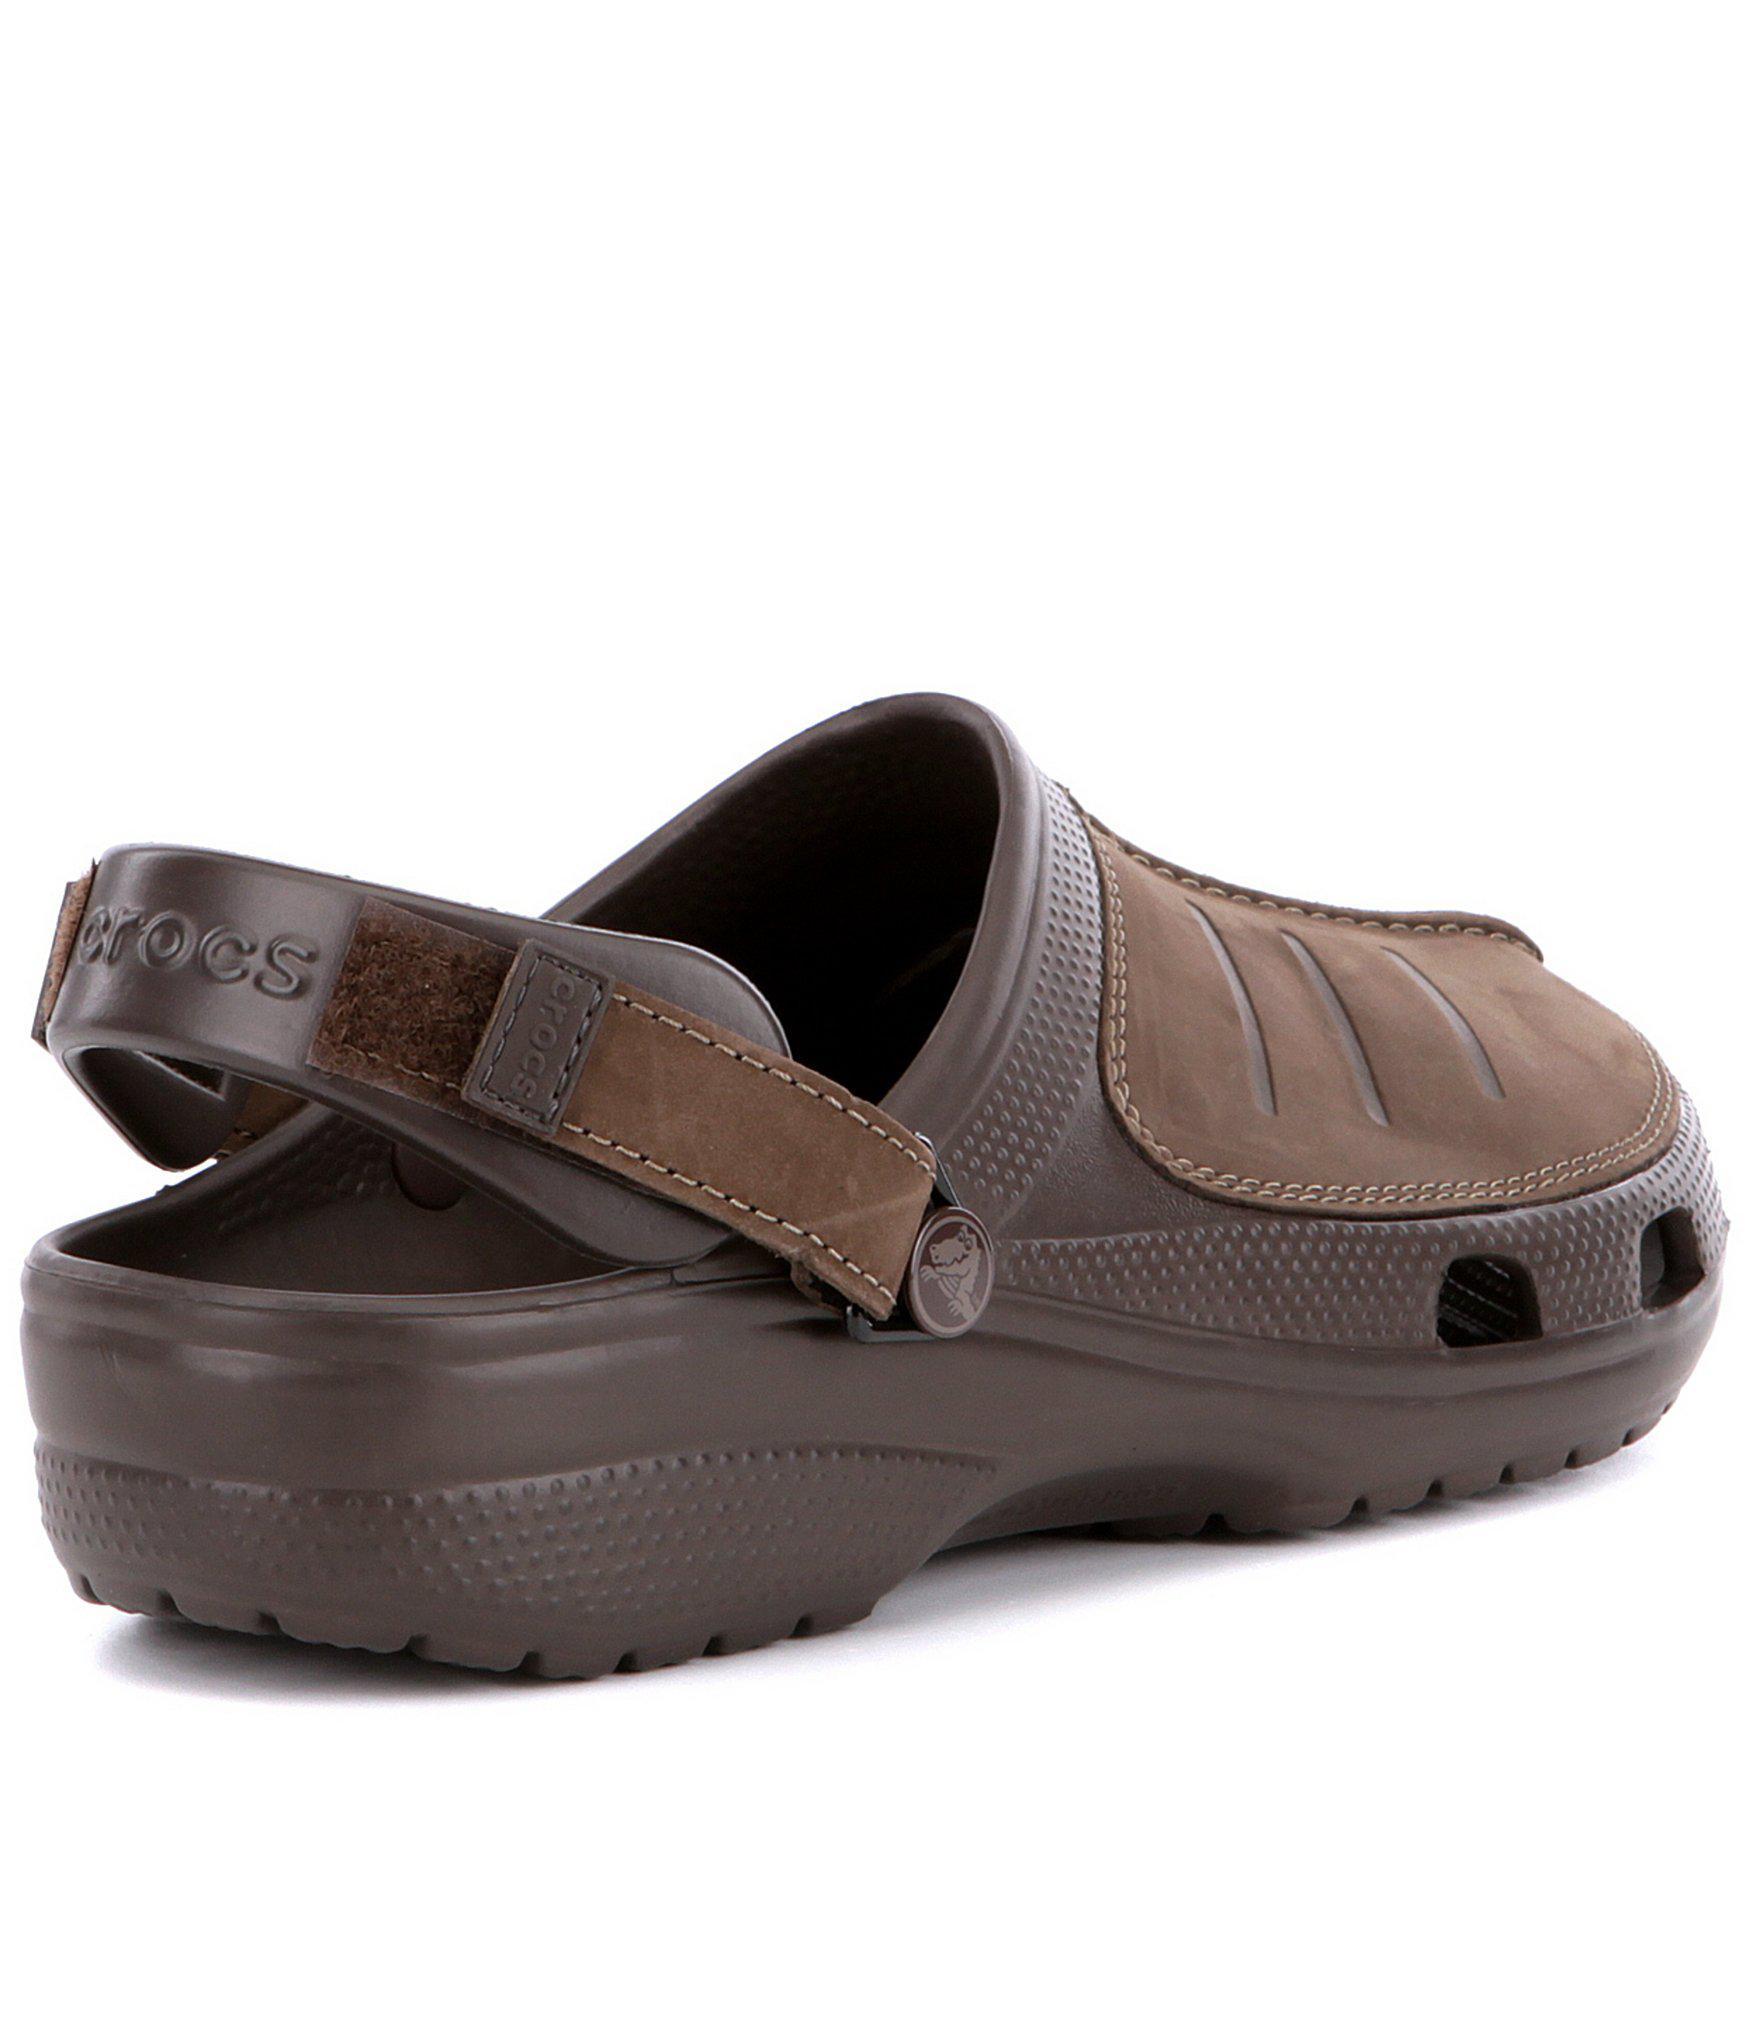 e457f2559 Crocs™ - Brown Men s Yukon Mesa Clogs for Men - Lyst. View fullscreen